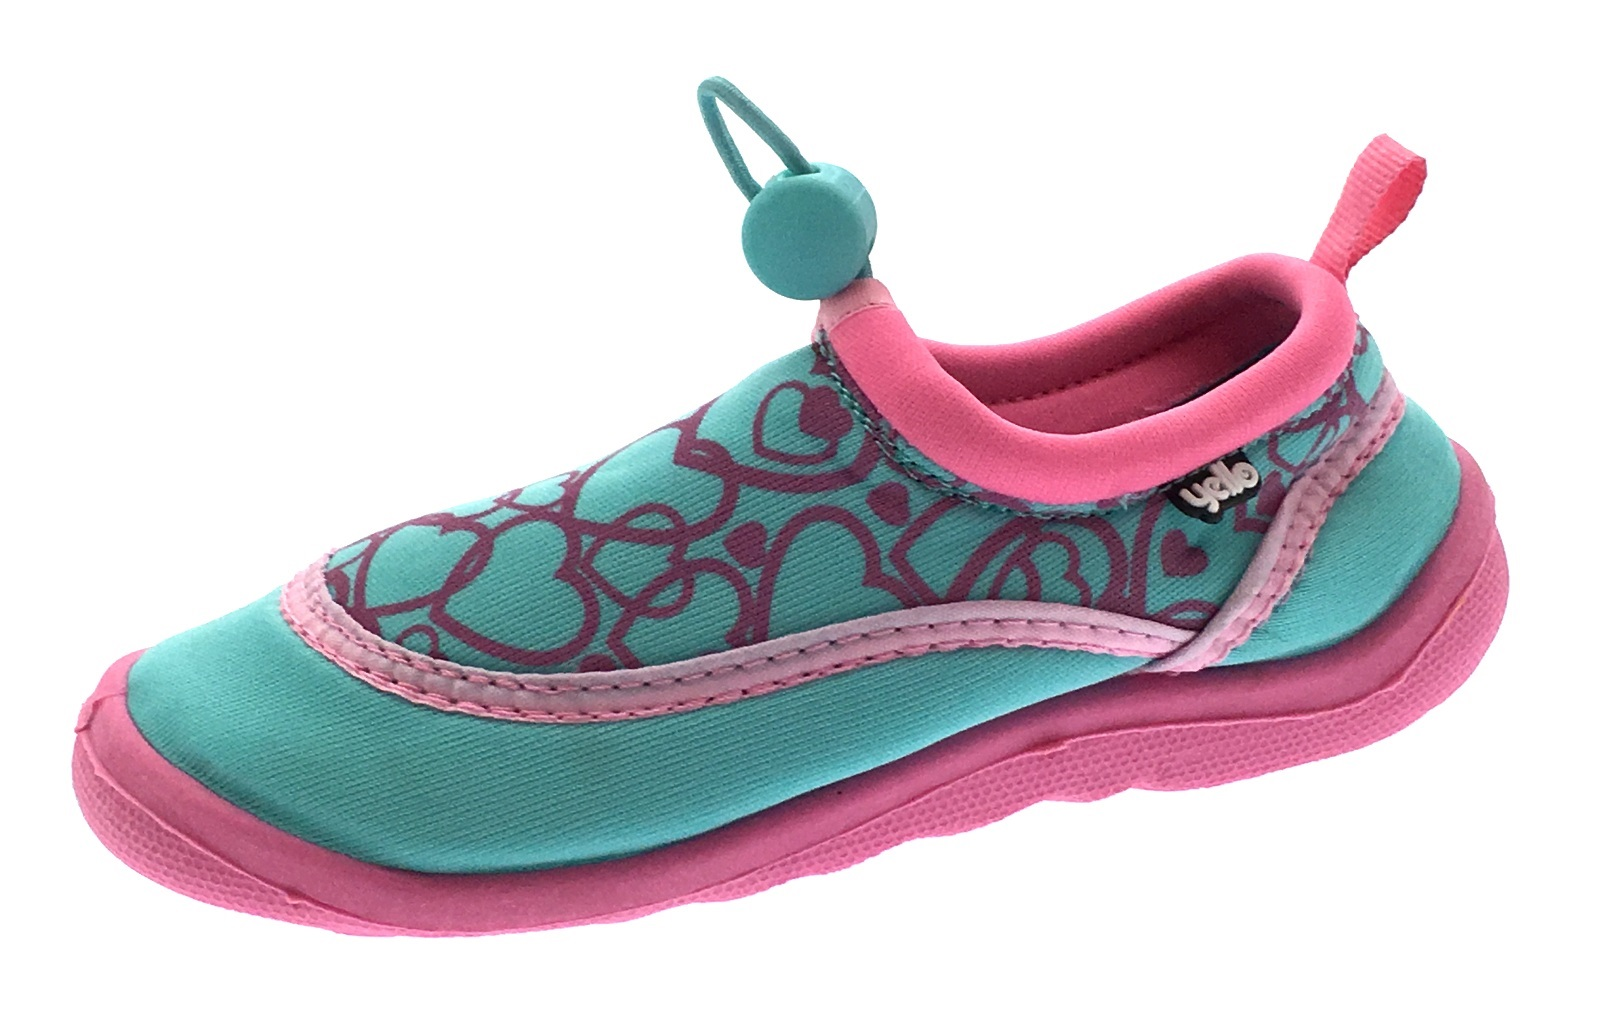 1dba547e355 Kids Boys Girls Aqua Socks Sandals Holiday Beach Swim Sea Wetsuit ...